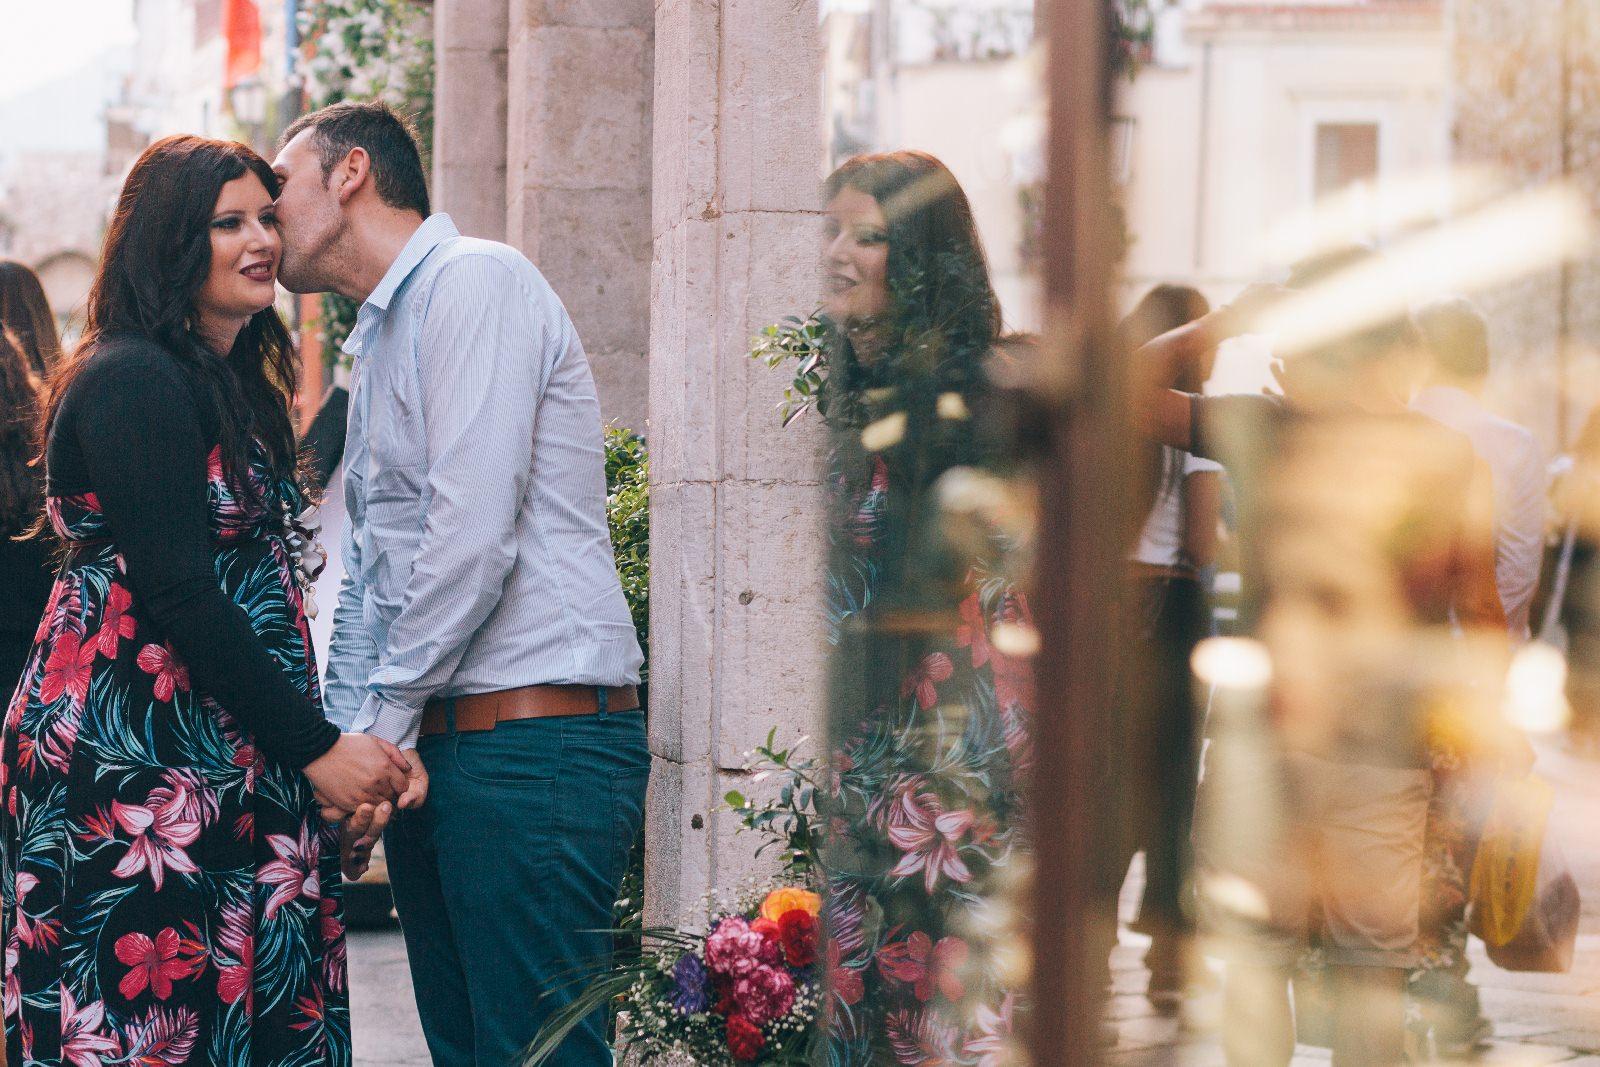 016-2018-09-22-Engagement-Alessandra-e-Igor-Pizzone-011